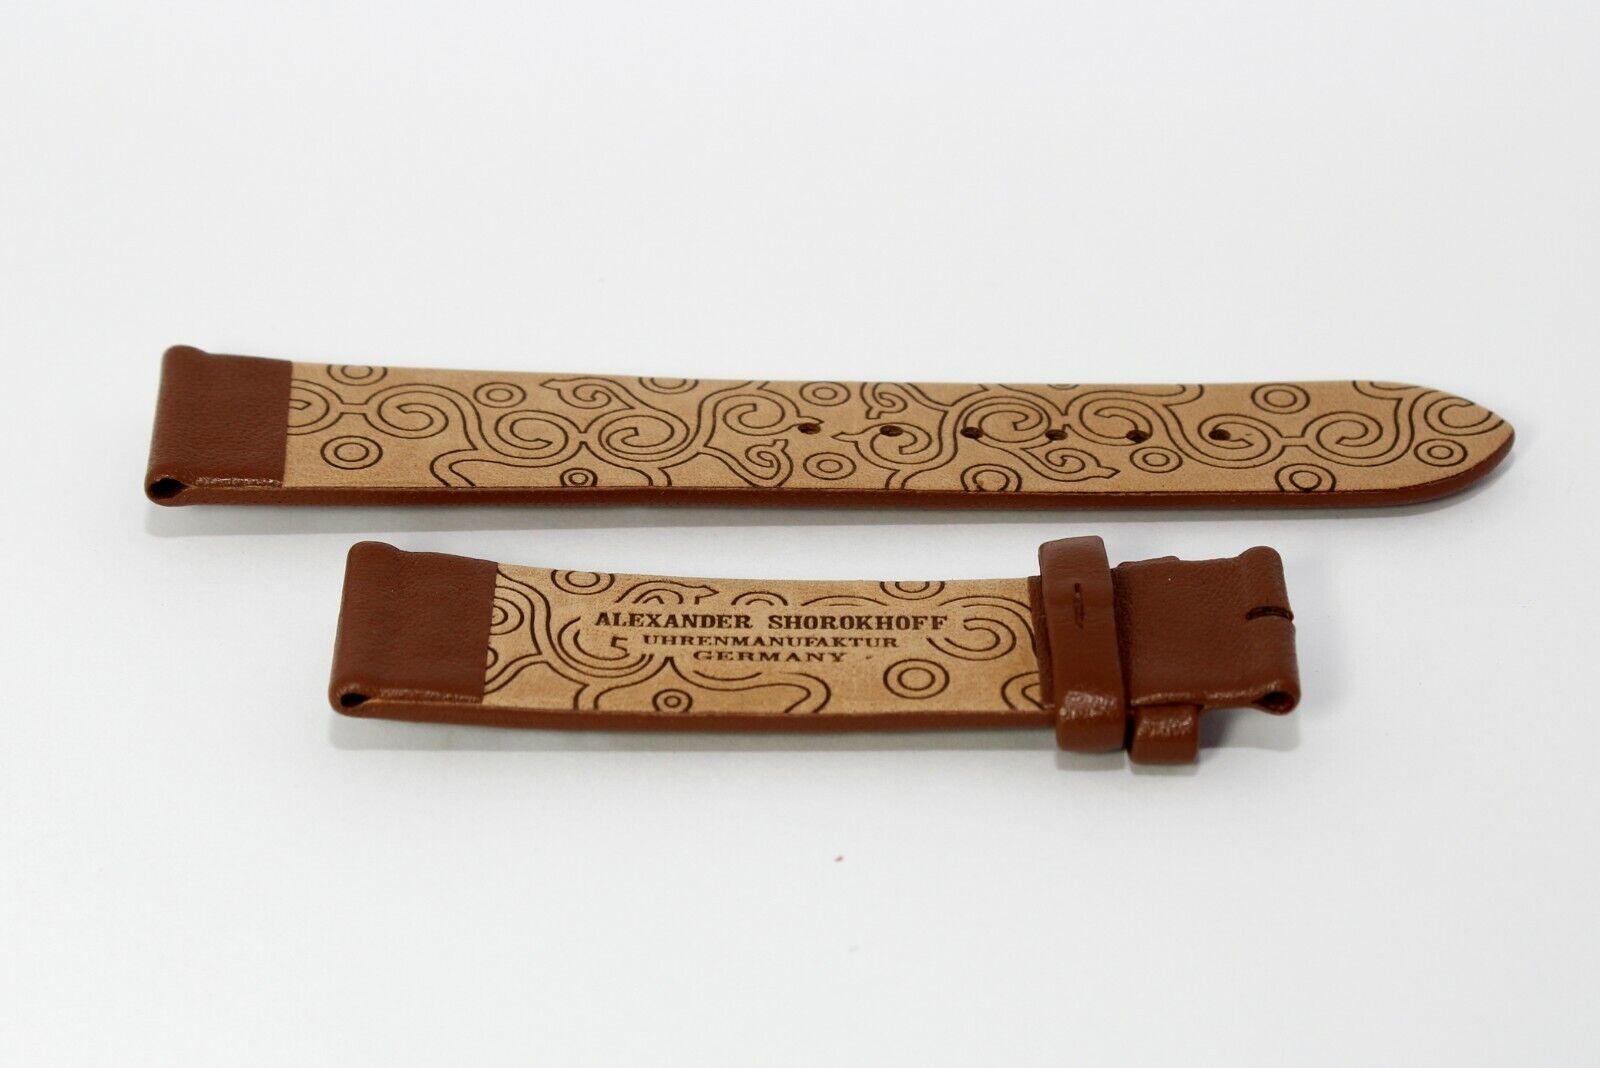 Damen Uhrenband Lederarmband 20 mm Braun mit Stickerei Kalbsleder SHOROKHOFF